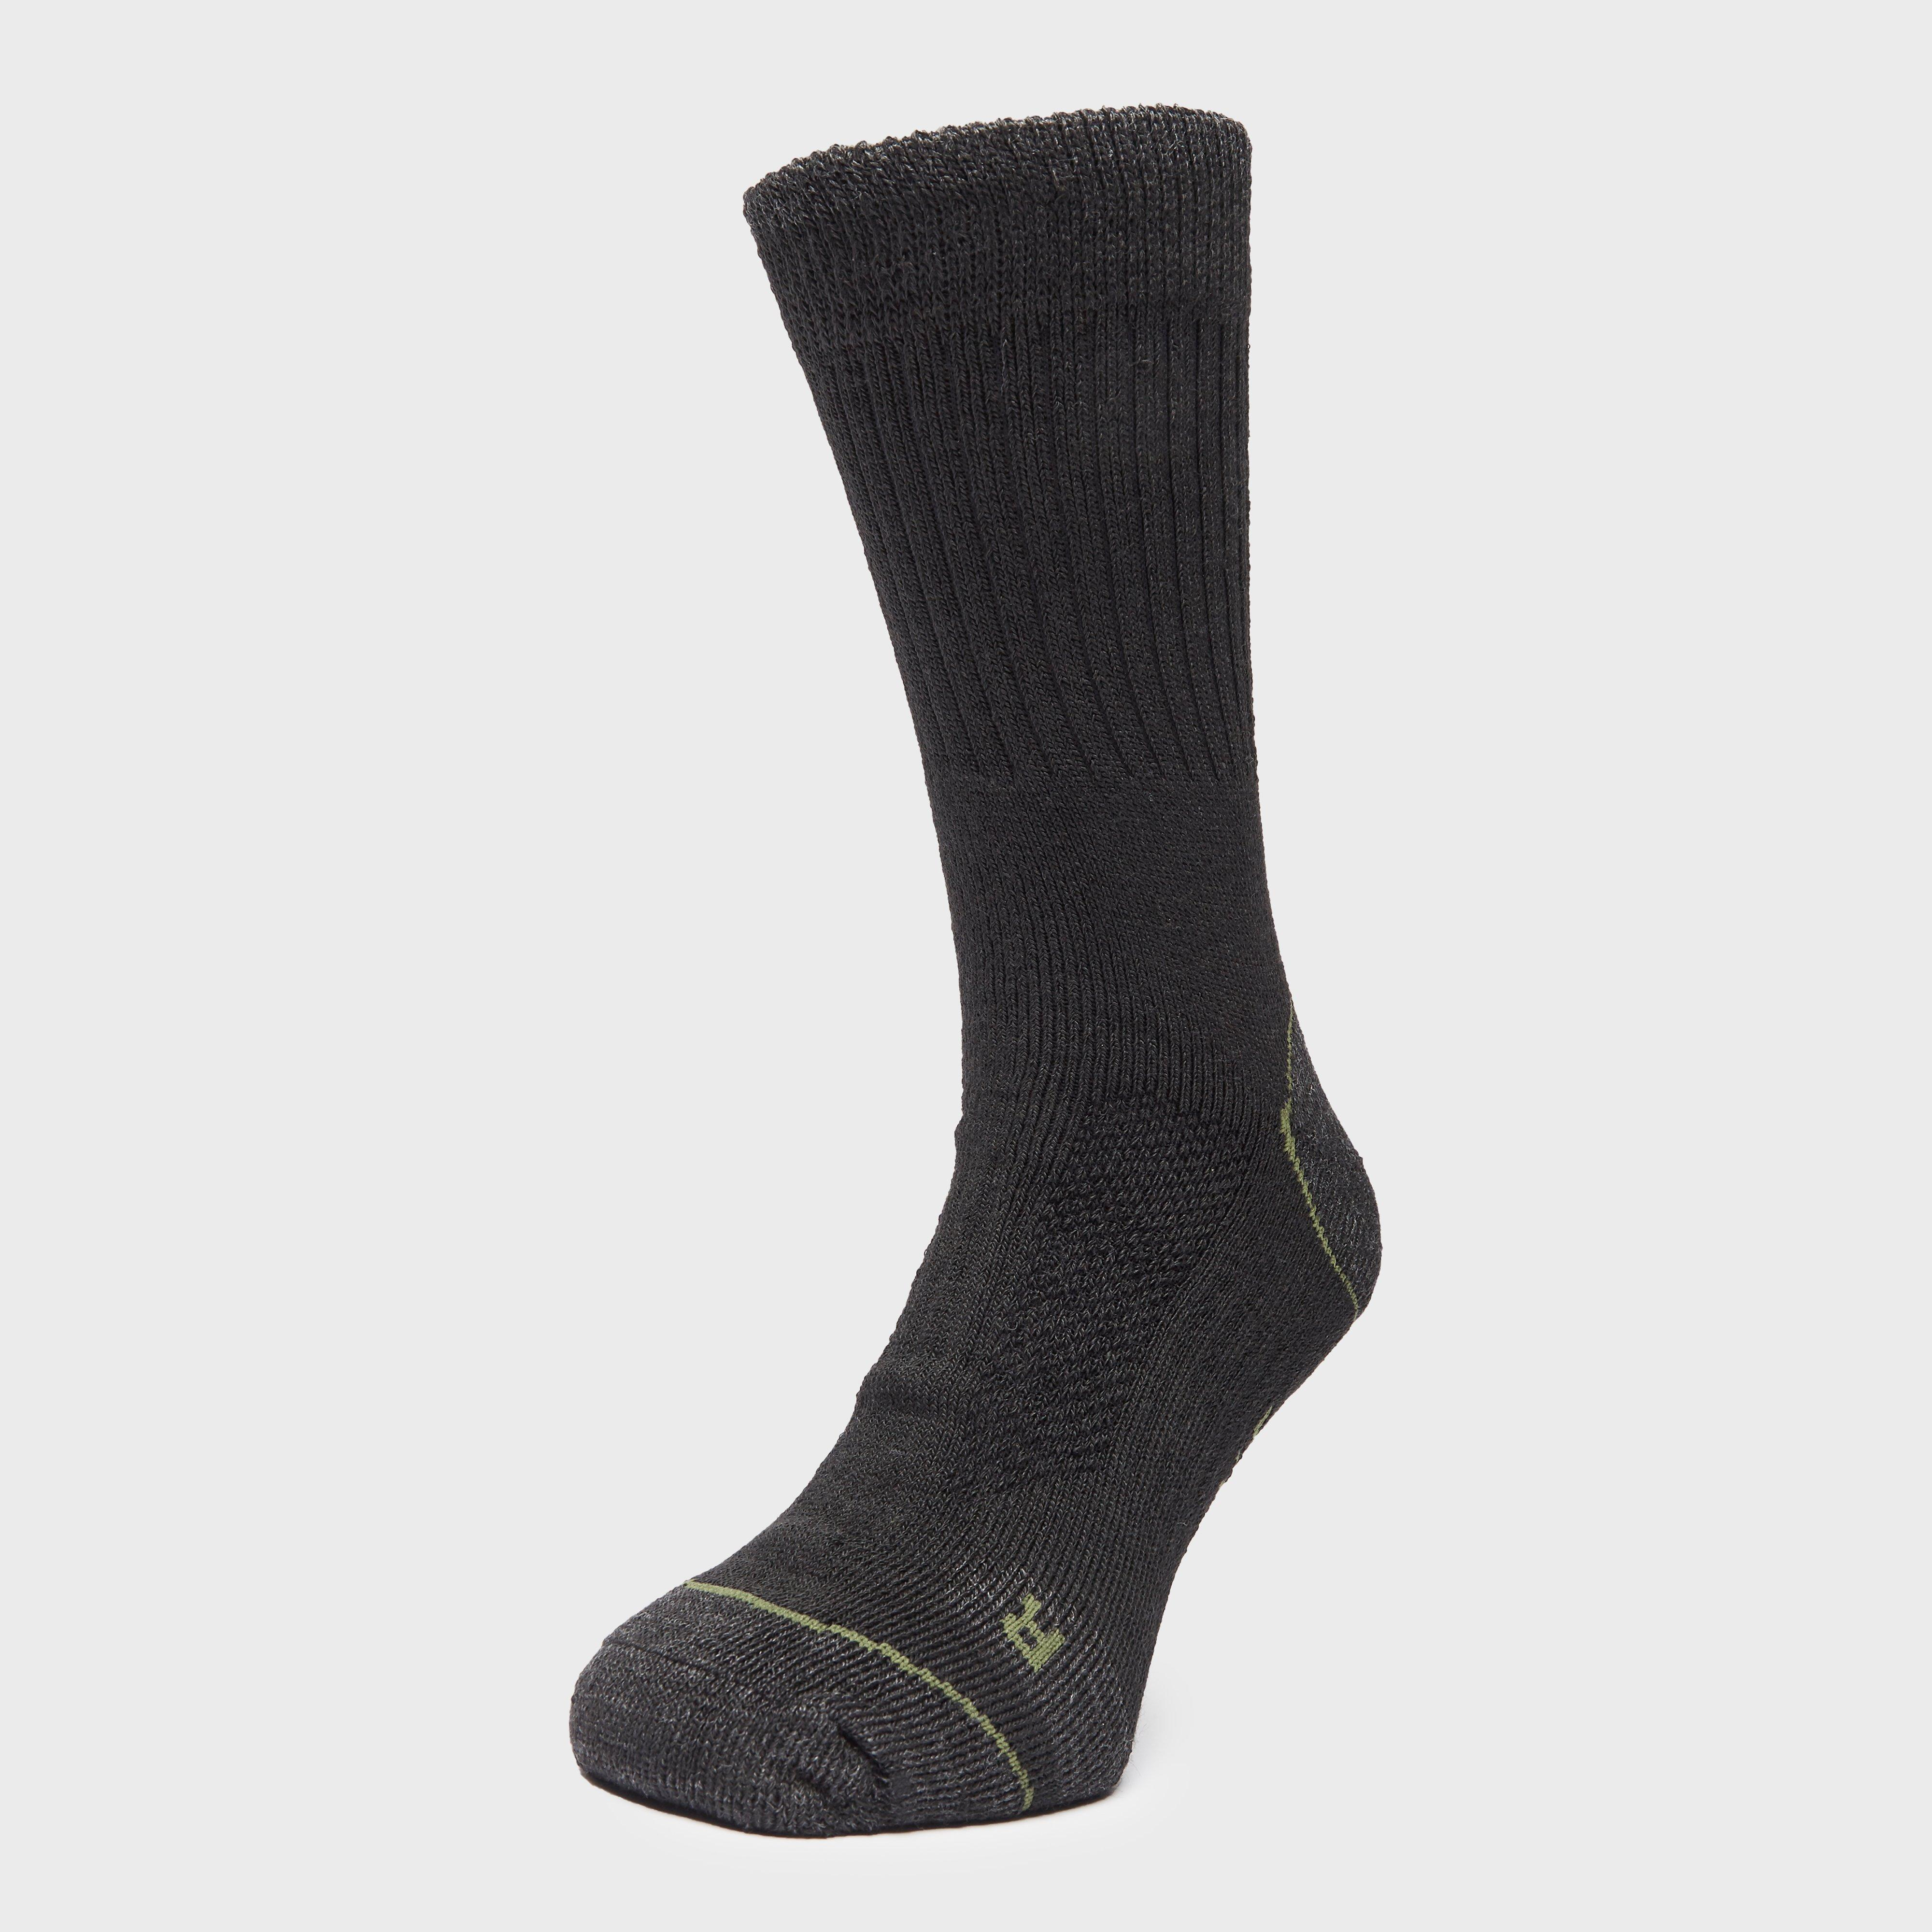 Brasher Mens Walker Socks - Black  Black